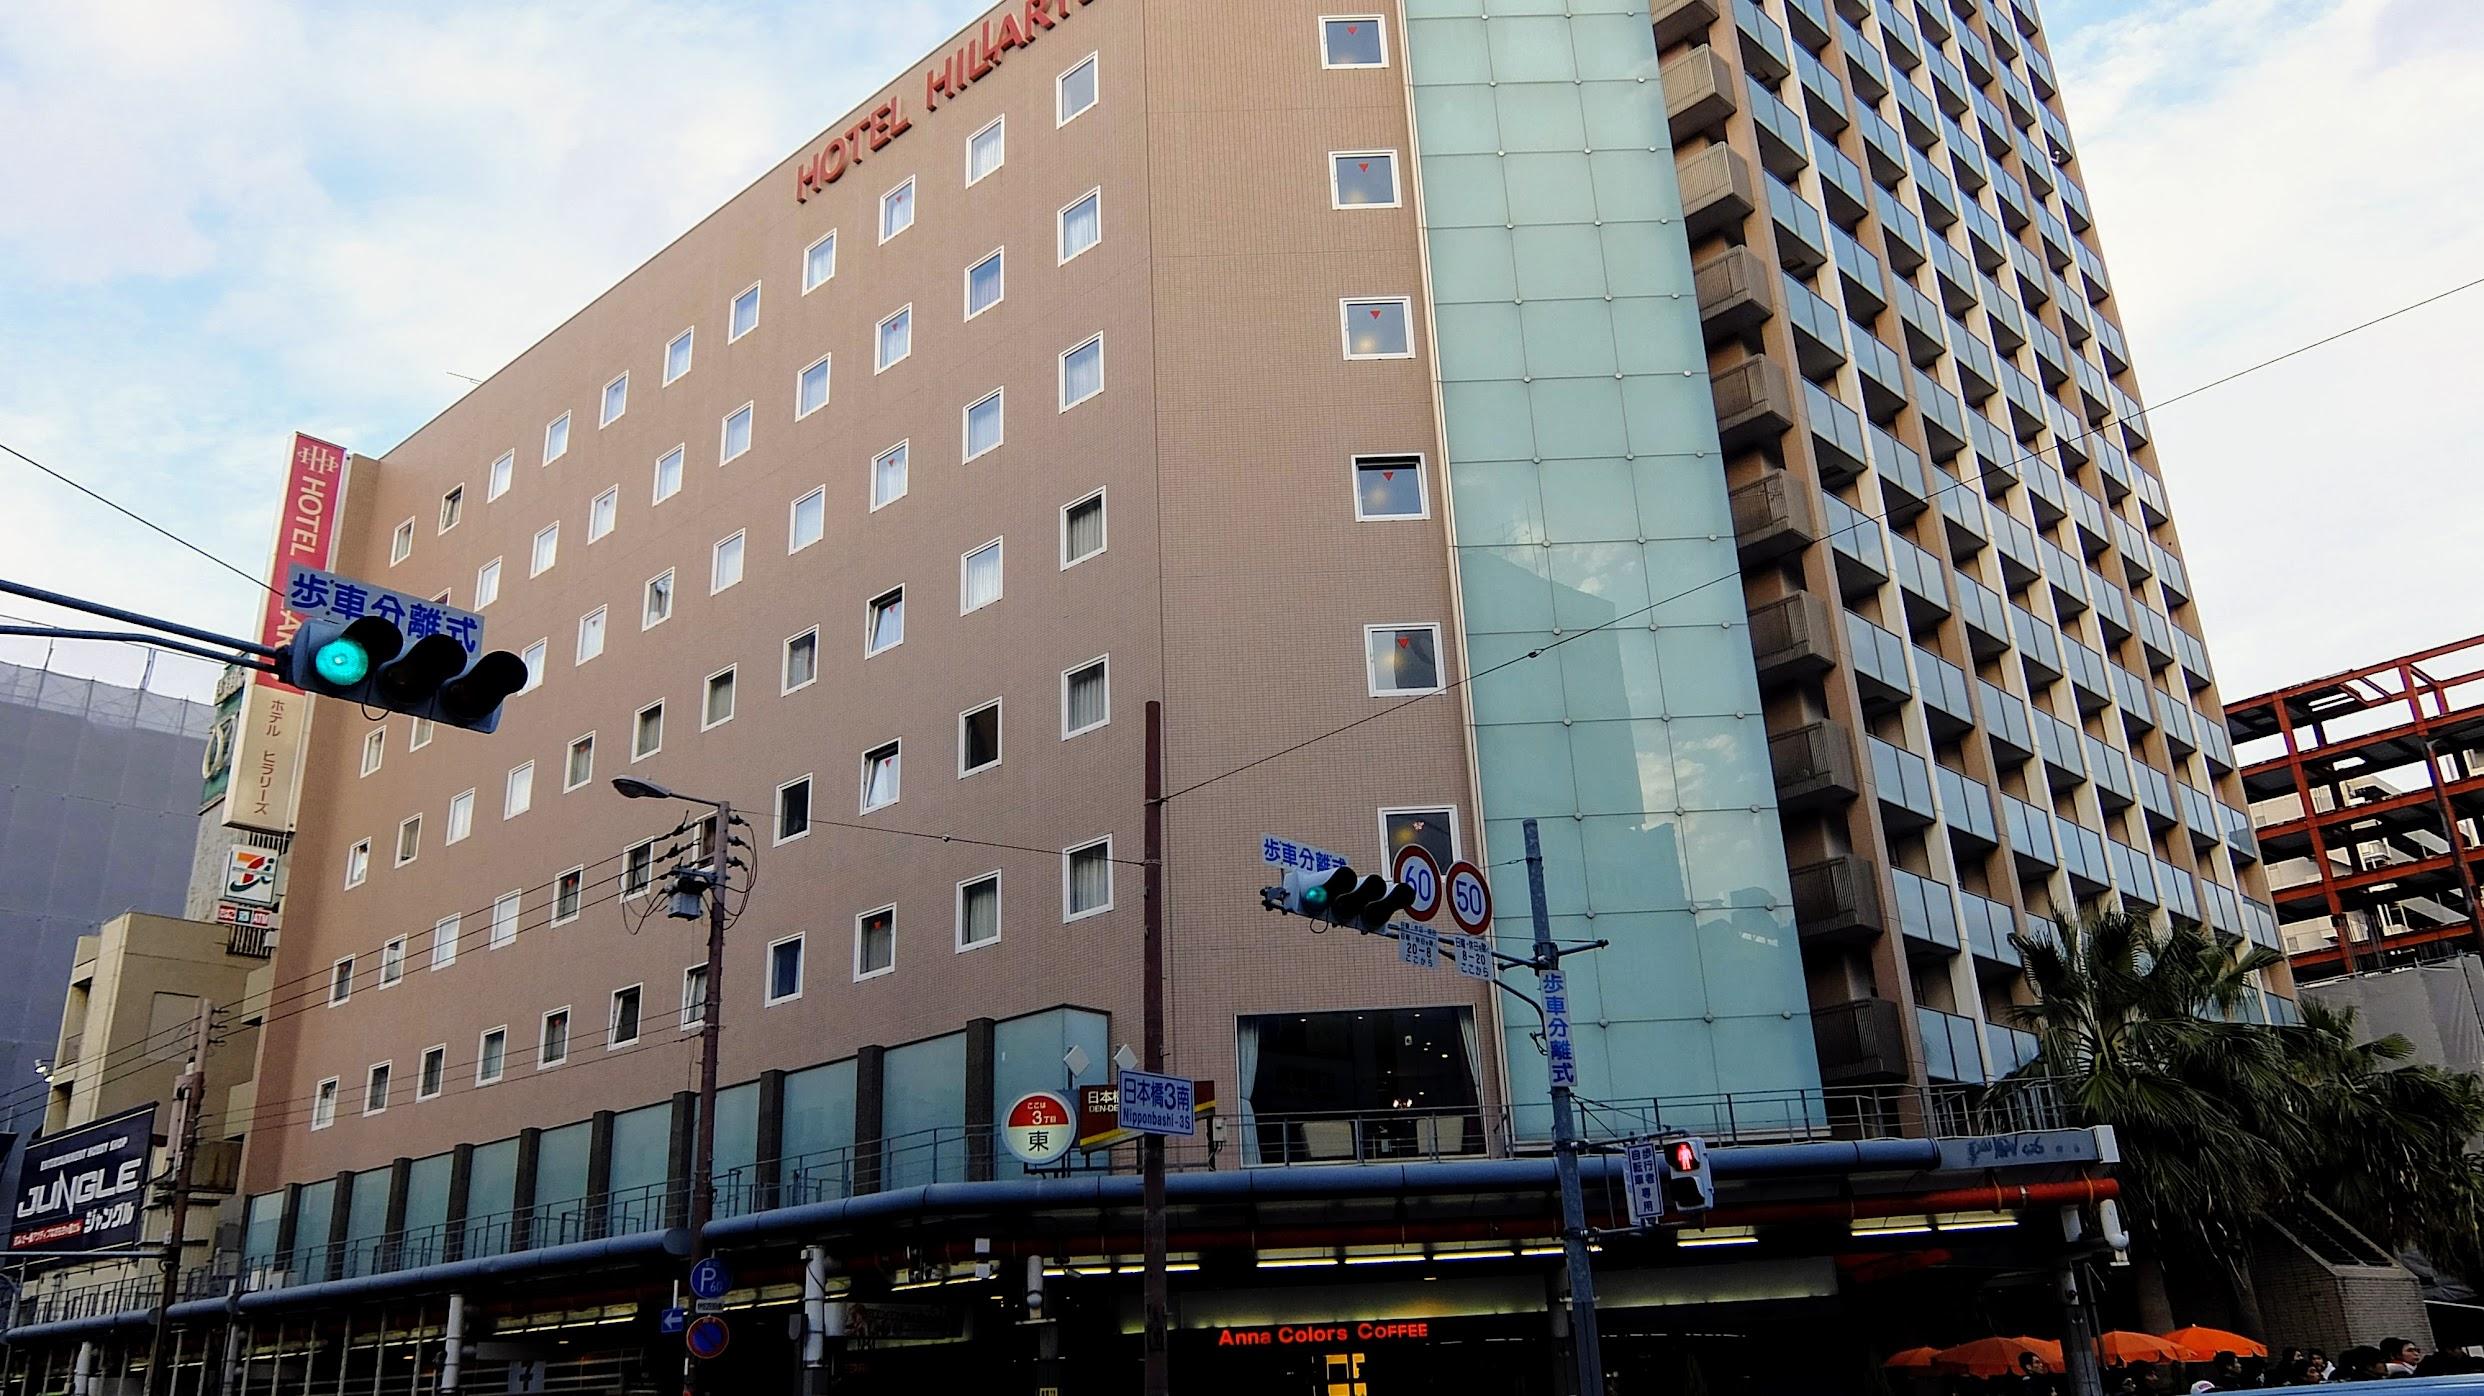 hotel hillarys Osaka,離南海難波站約五分鐘的腳程距離,而飯店附近剛好就是日本橋熱鬧的地方喔..